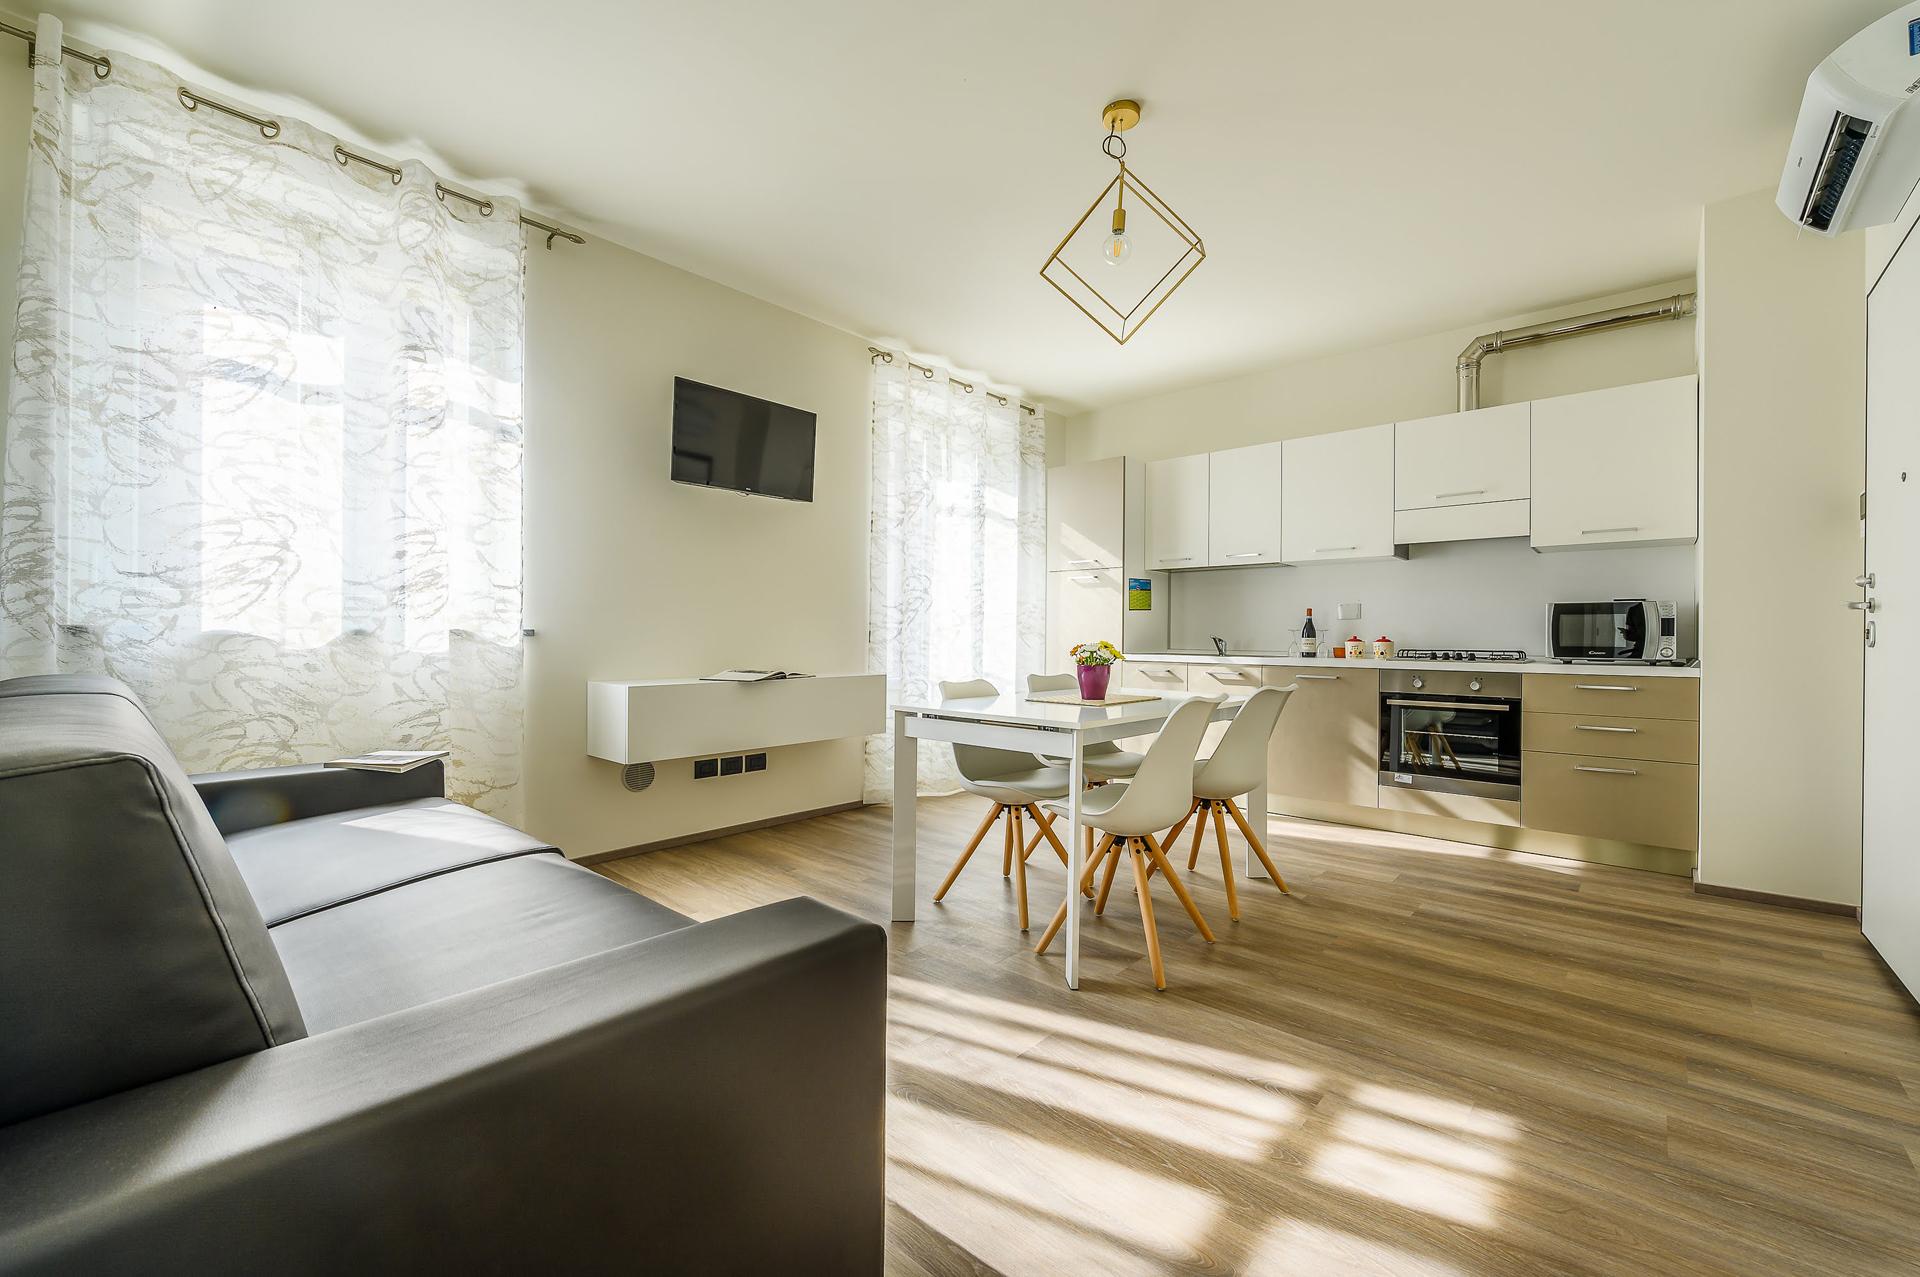 Appartamenti attrezzati in residence